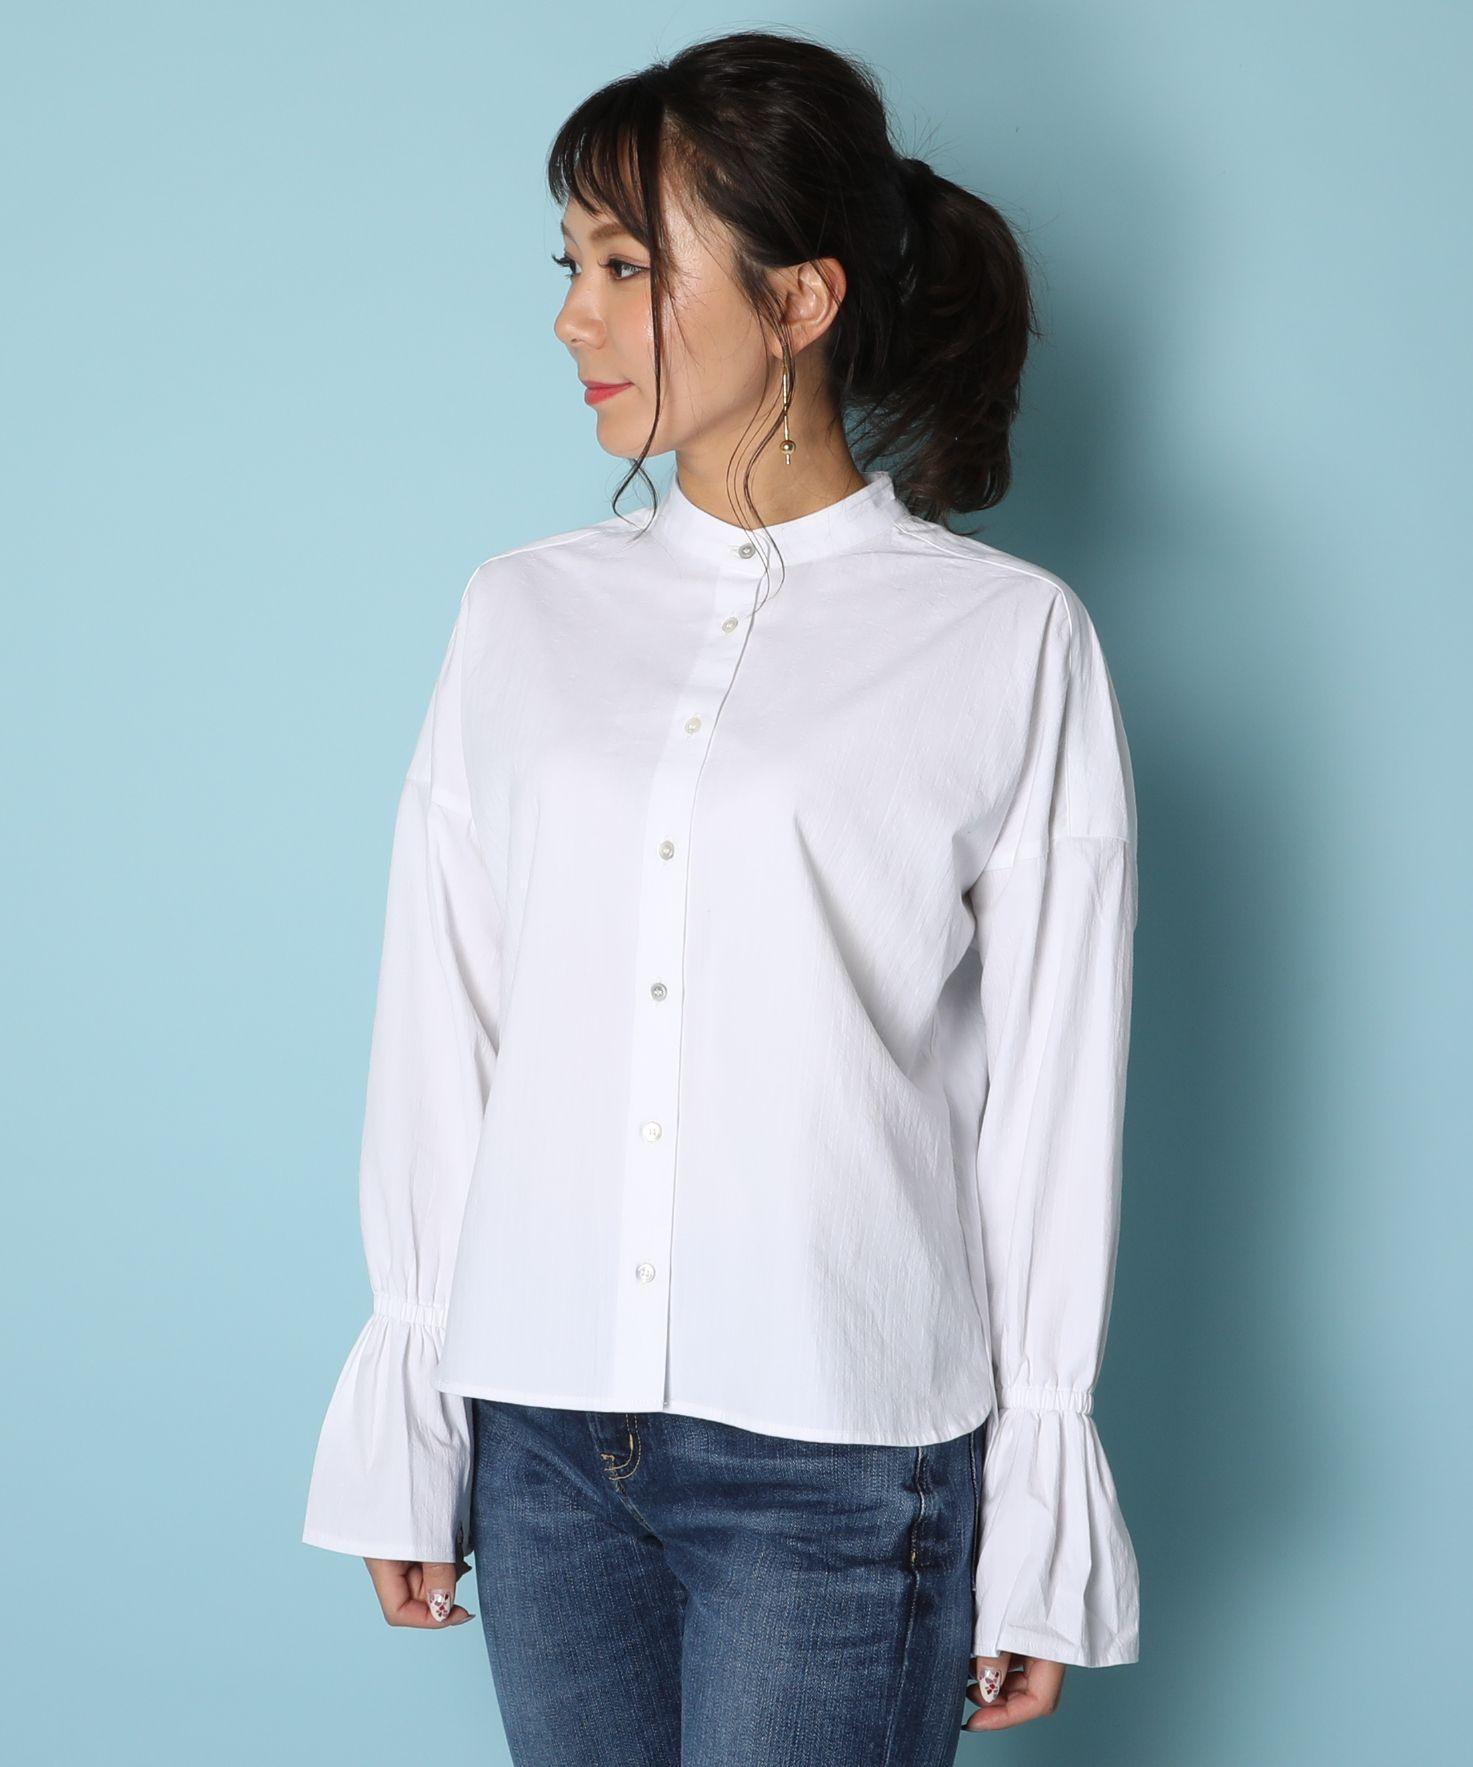 American Rag Cie Frill Shirt/アメリカンラグシー フリルシャツ